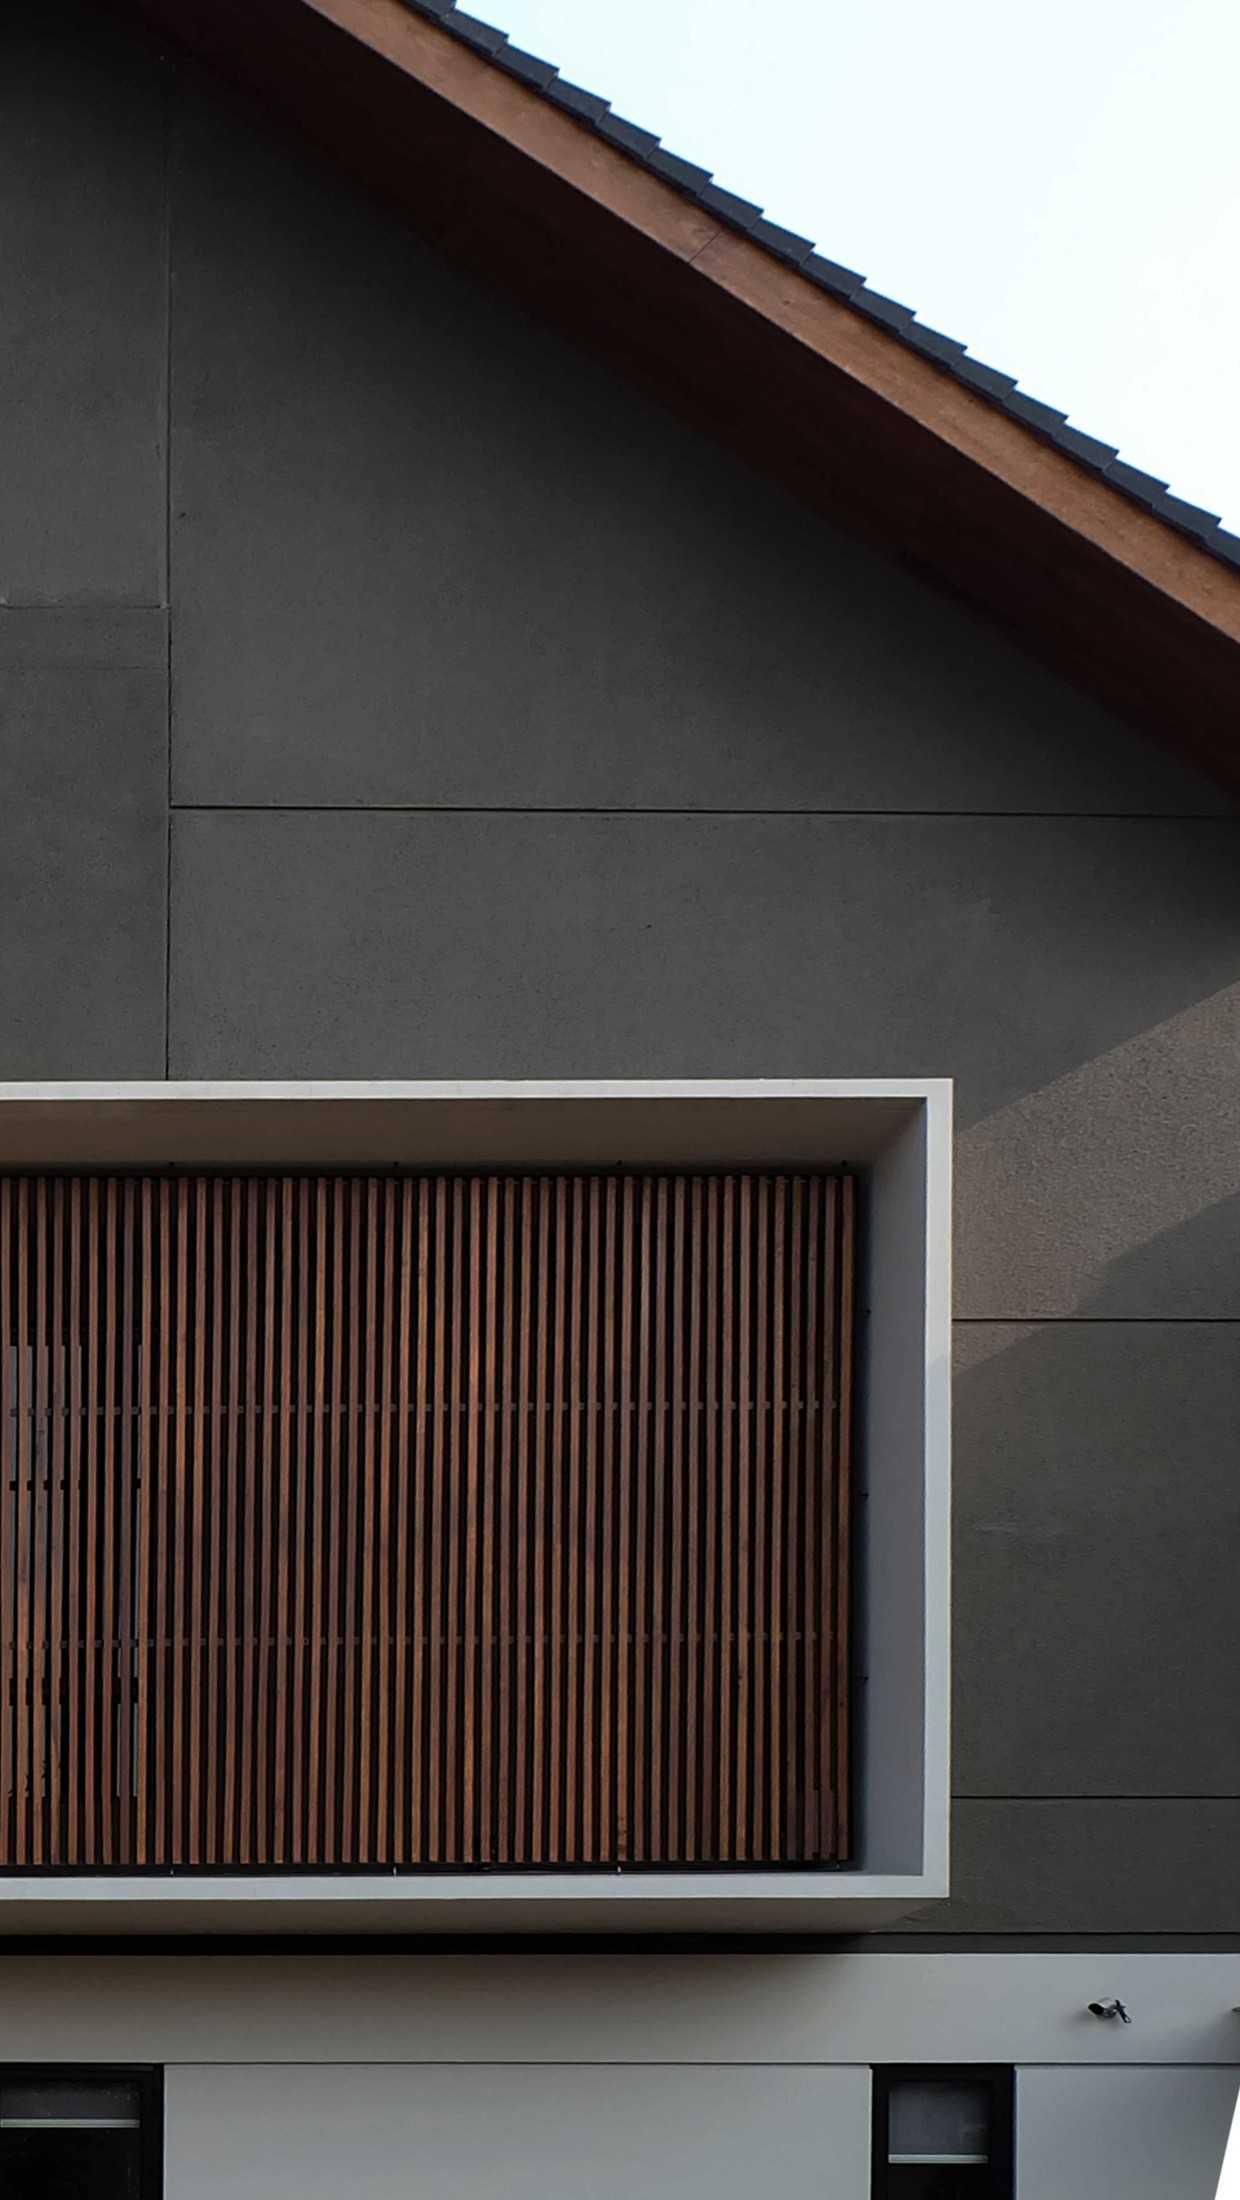 Gohte Architects Vk Homes Lippo Karawaci, Binong, Kec. Curug, Tangerang, Banten, Indonesia Lippo Karawaci, Binong, Kec. Curug, Tangerang, Banten, Indonesia Gohte-Architects-Vk-Homes  96614